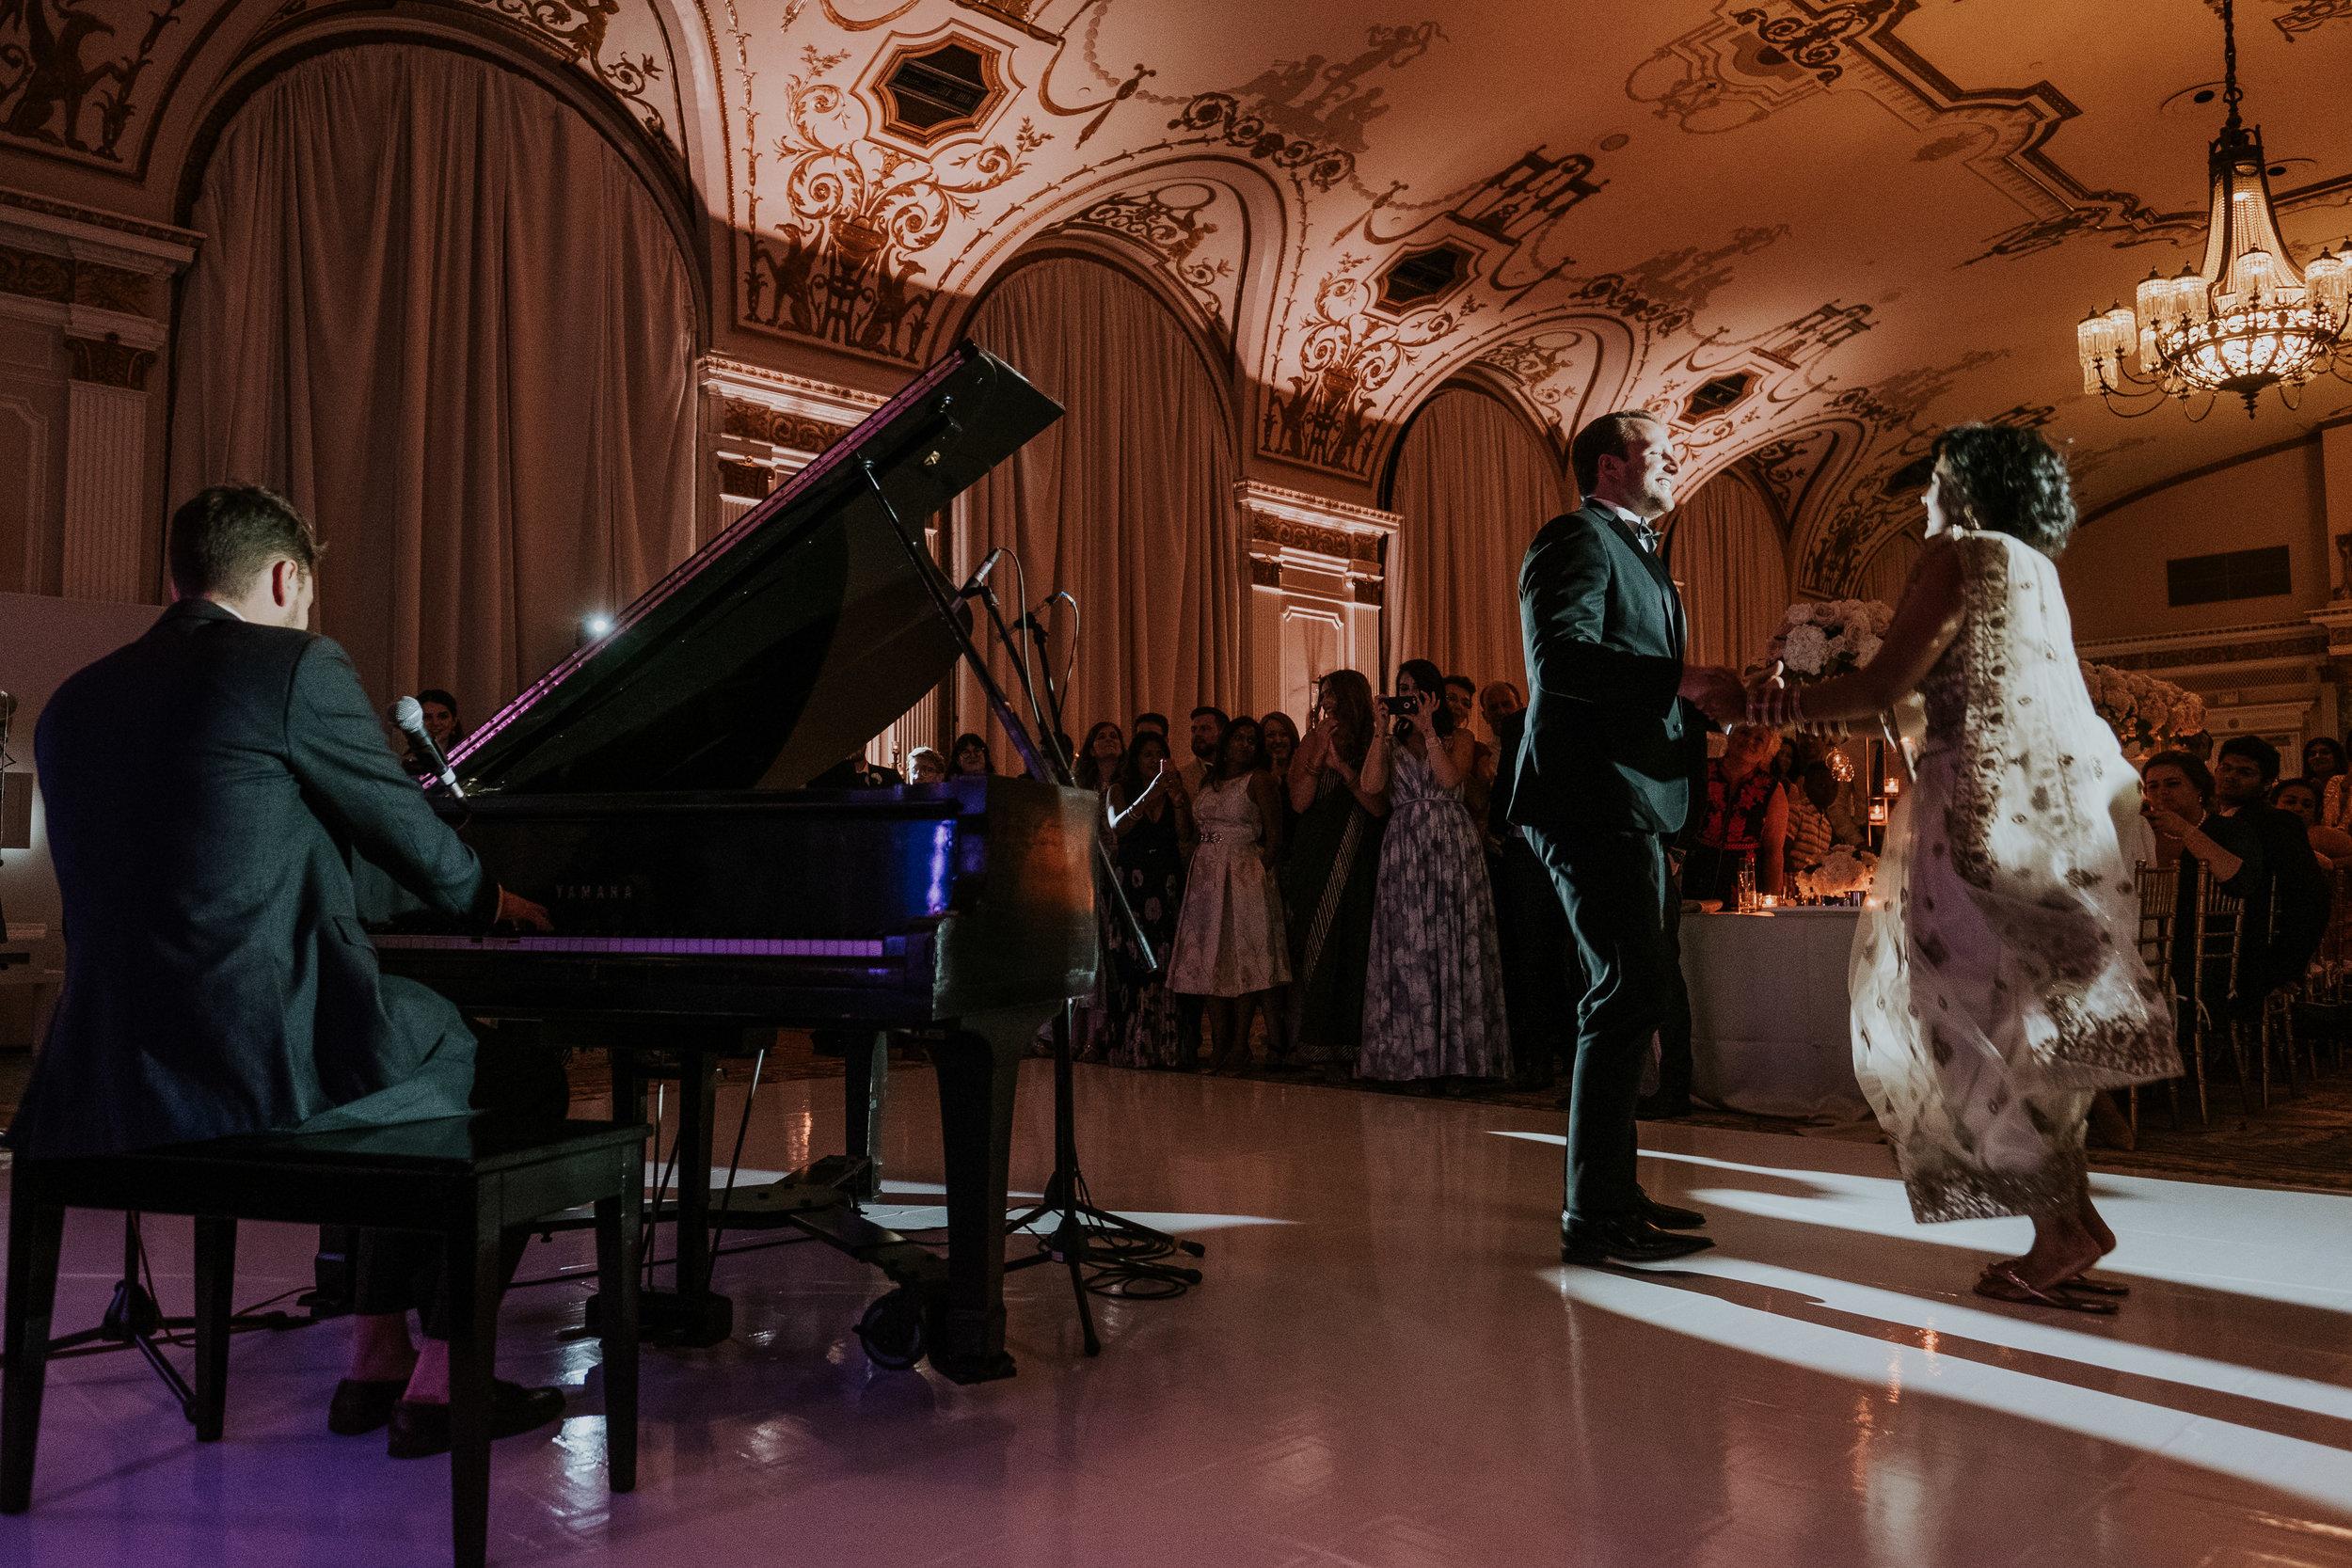 Komal Minhas Wedding Chateau Laurier, Toast Events, Tim Baker Performance